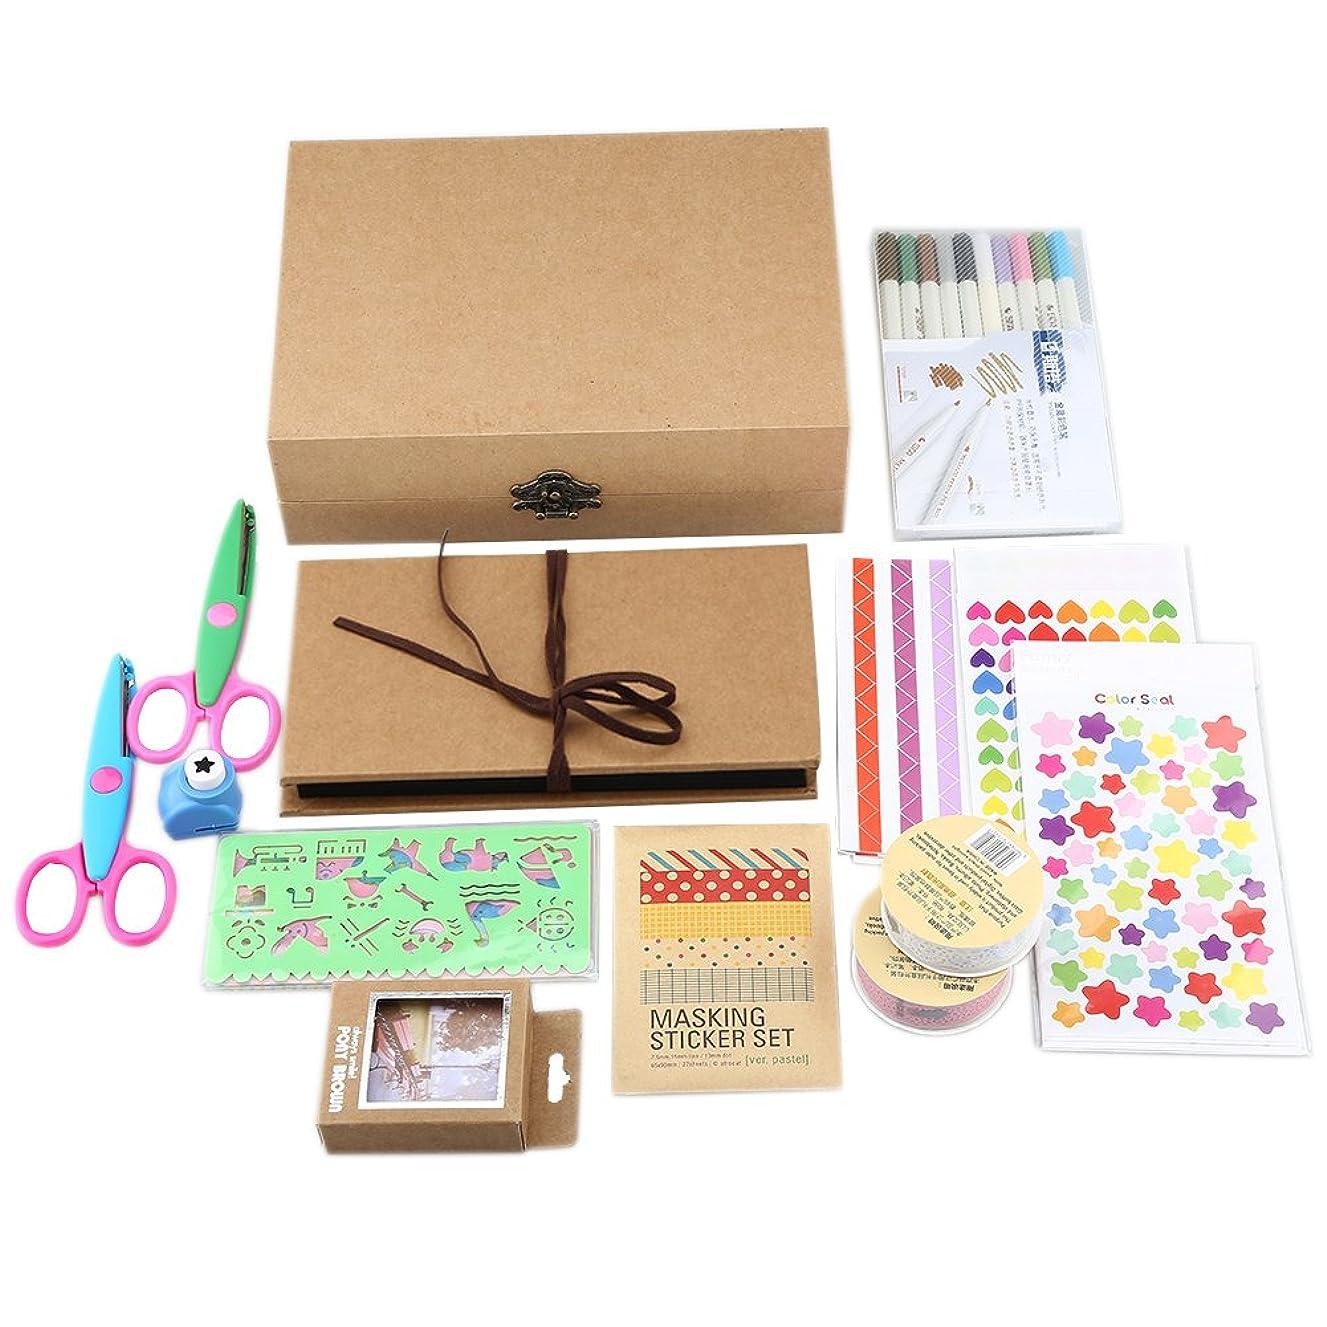 Gotideal DIY Scrapbook Album Craft Paper Wedding and Anniversary Photo Album Family Scrapbook with Photo Album Storage Box , DIY Accessories Kit and Scrapbooking Supplies (Pure)